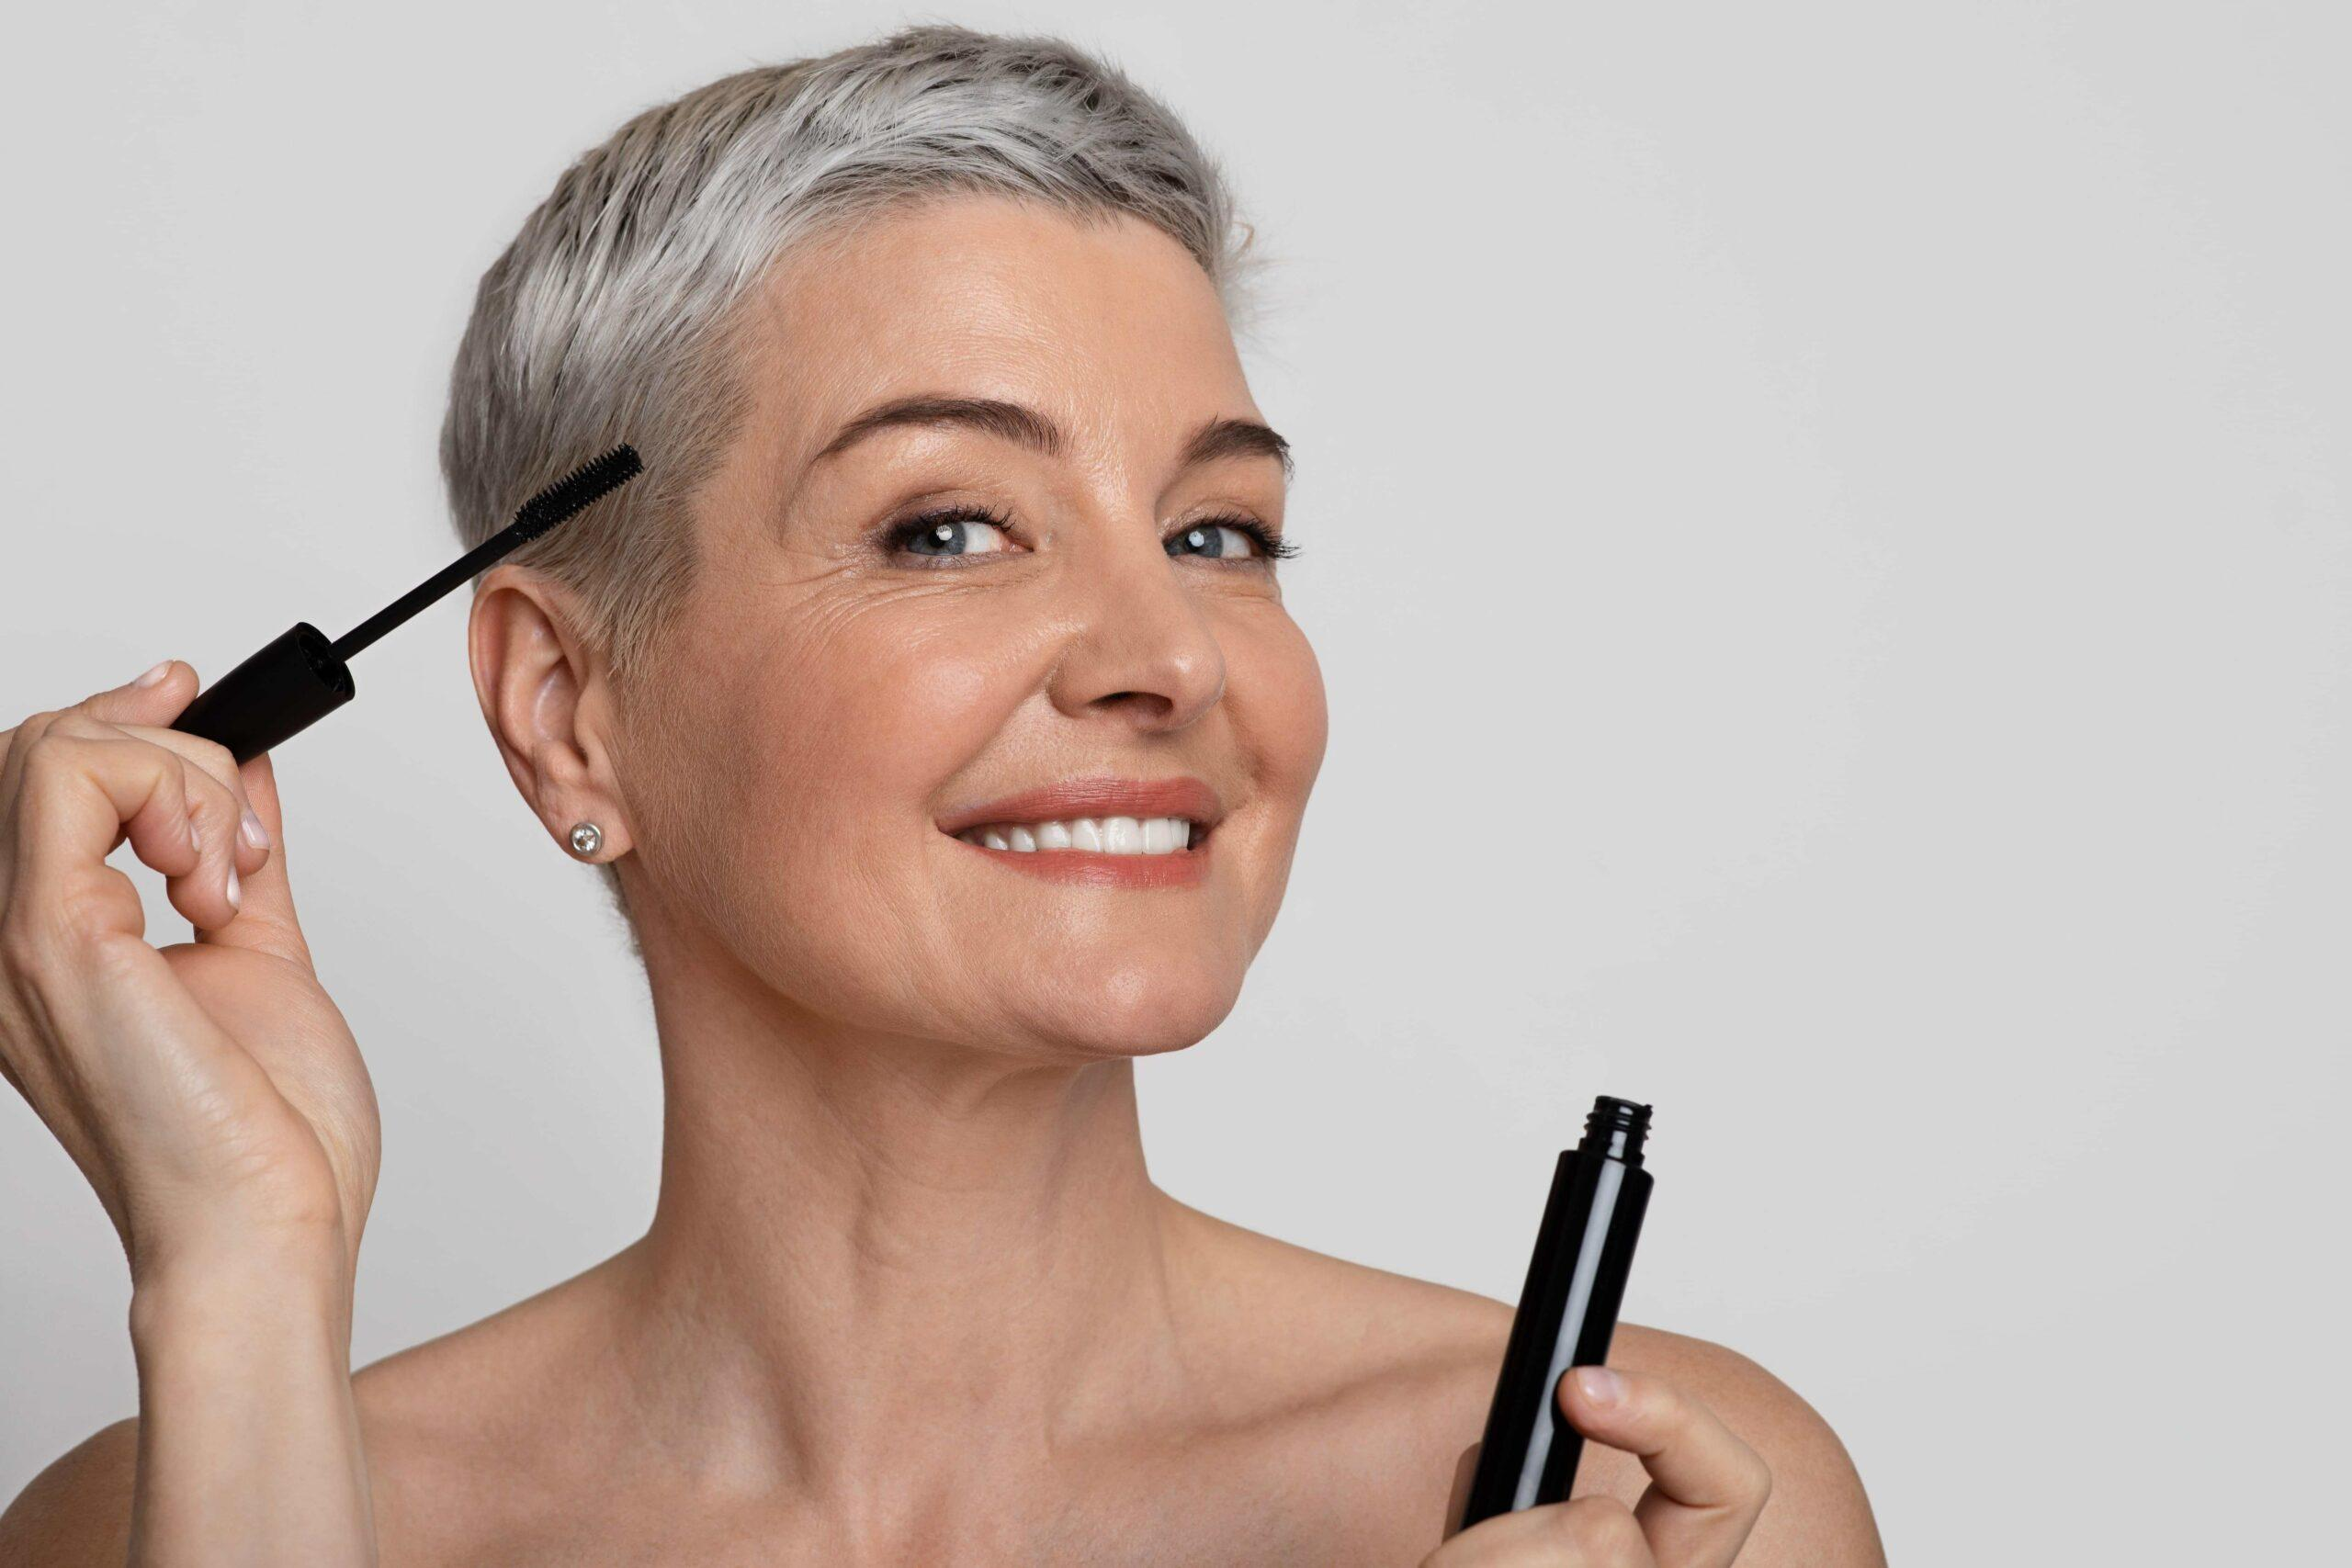 How to Grow Longer Eyelashes Over 40